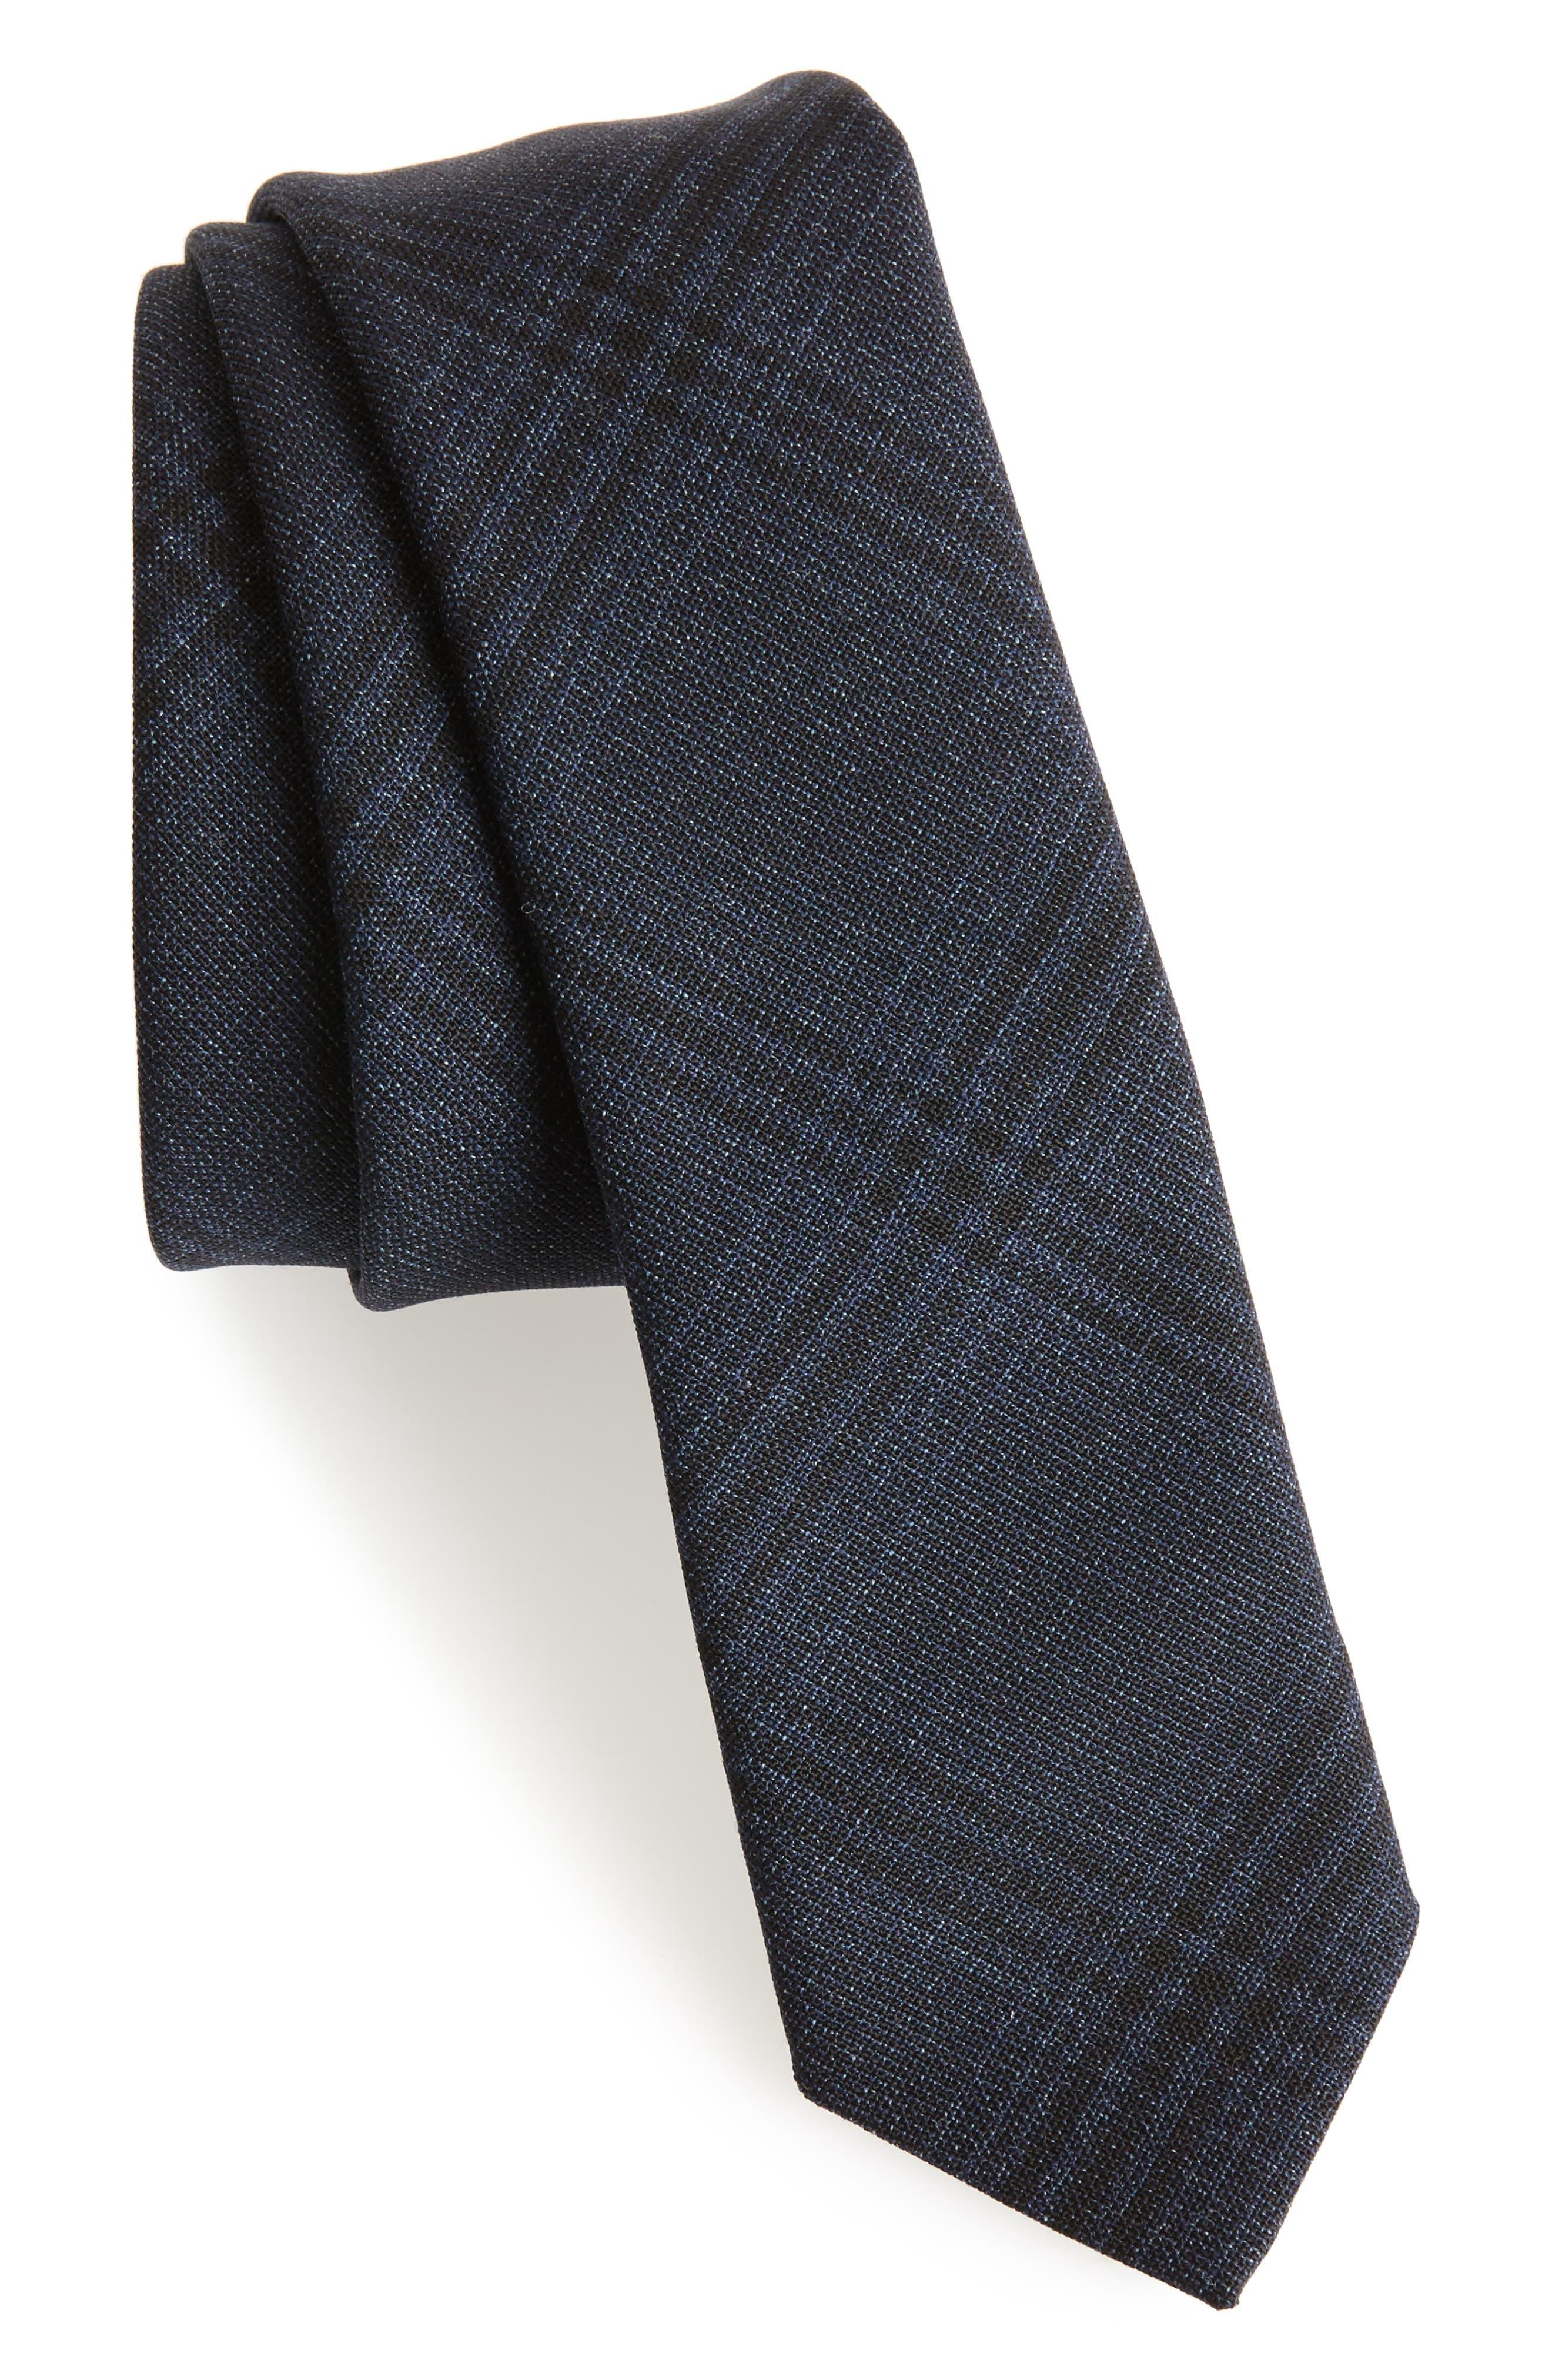 Alternate Image 1 Selected - Eleventy Plaid Wool Tie